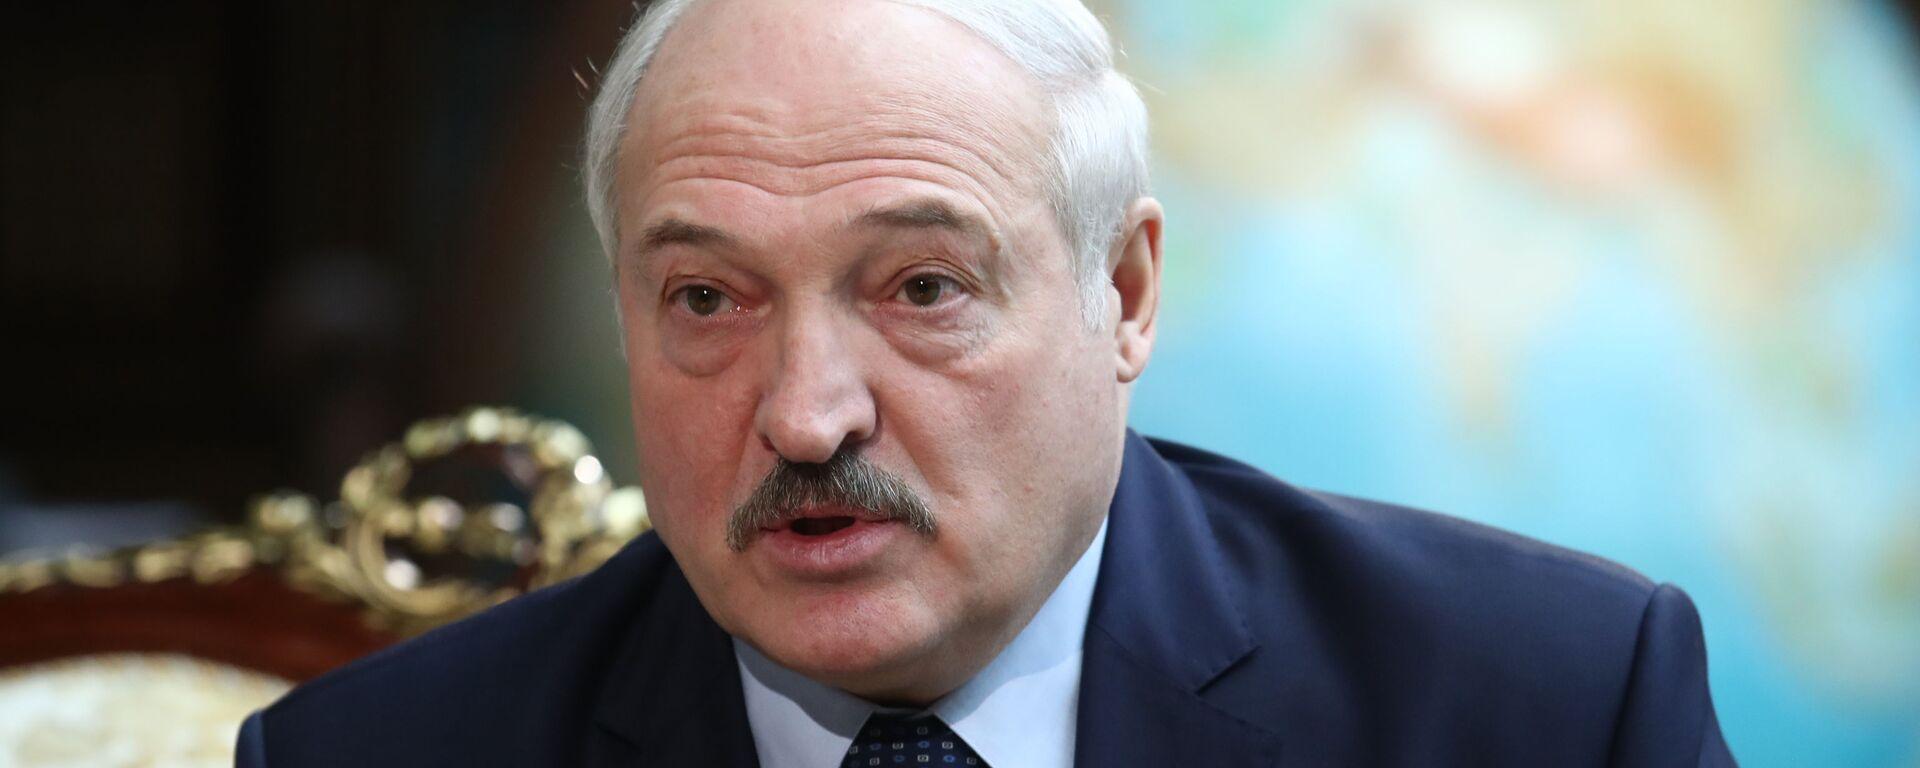 Президент Беларуси Александр Лукашенко - Sputnik Latvija, 1920, 25.05.2021